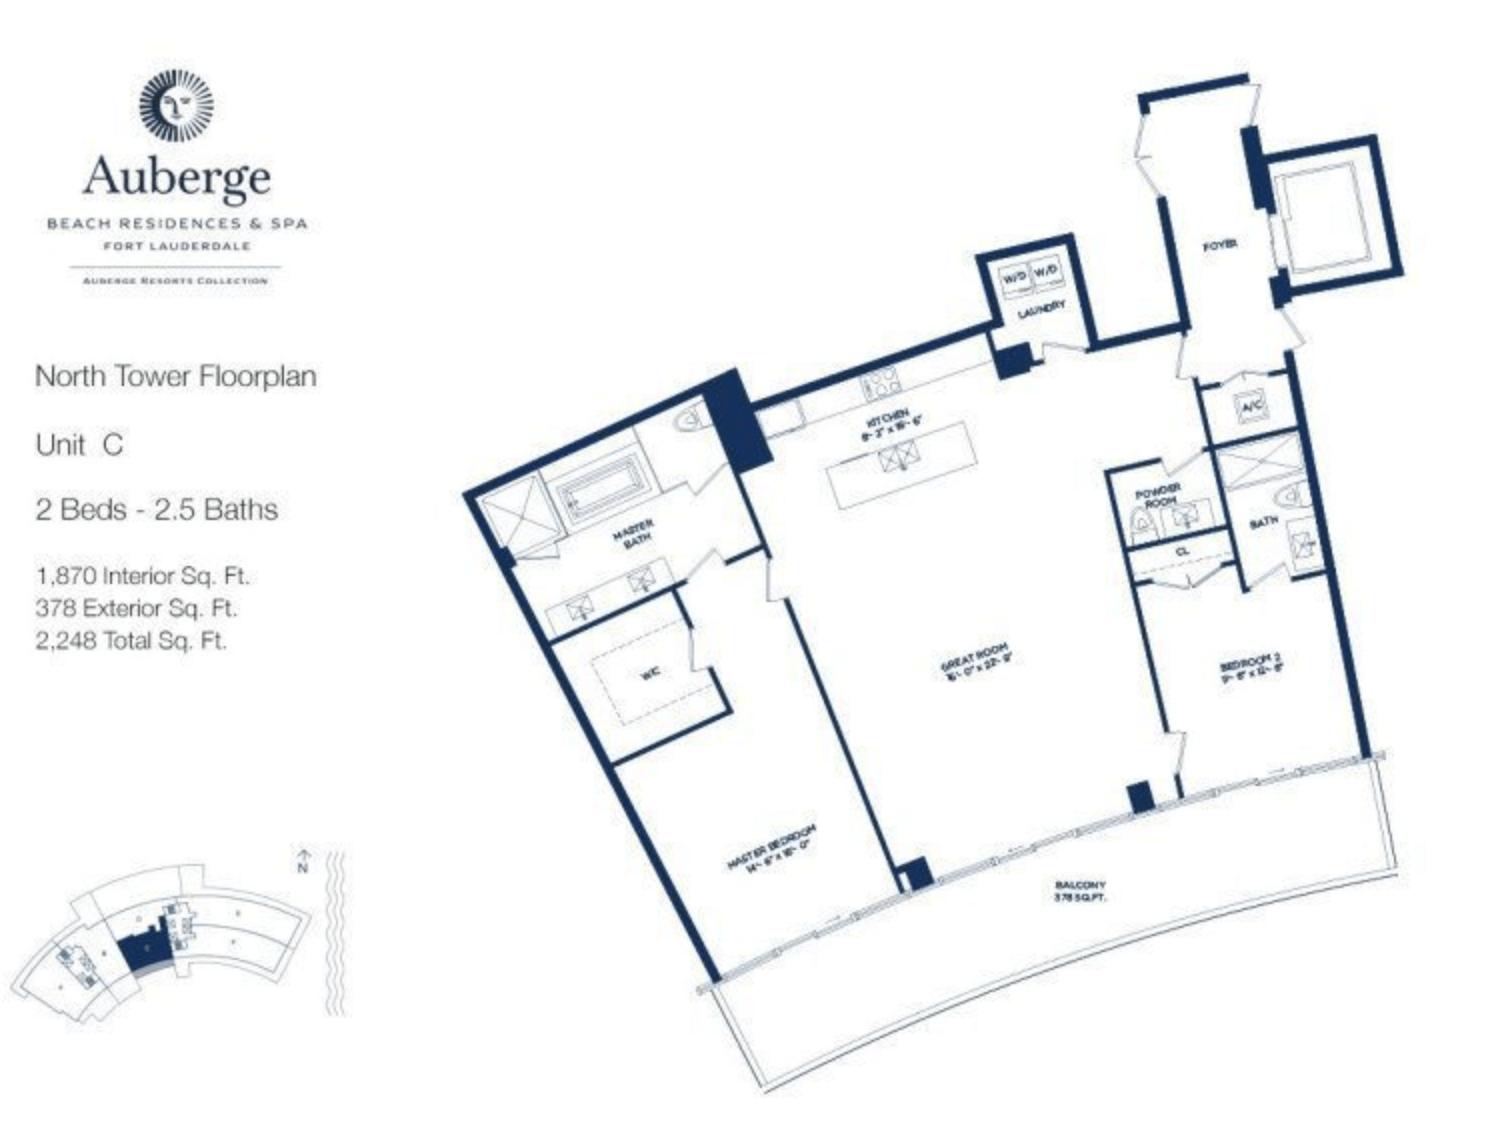 Auberge Beach Residences North Tower C | 2 Beds - 2.5 baths